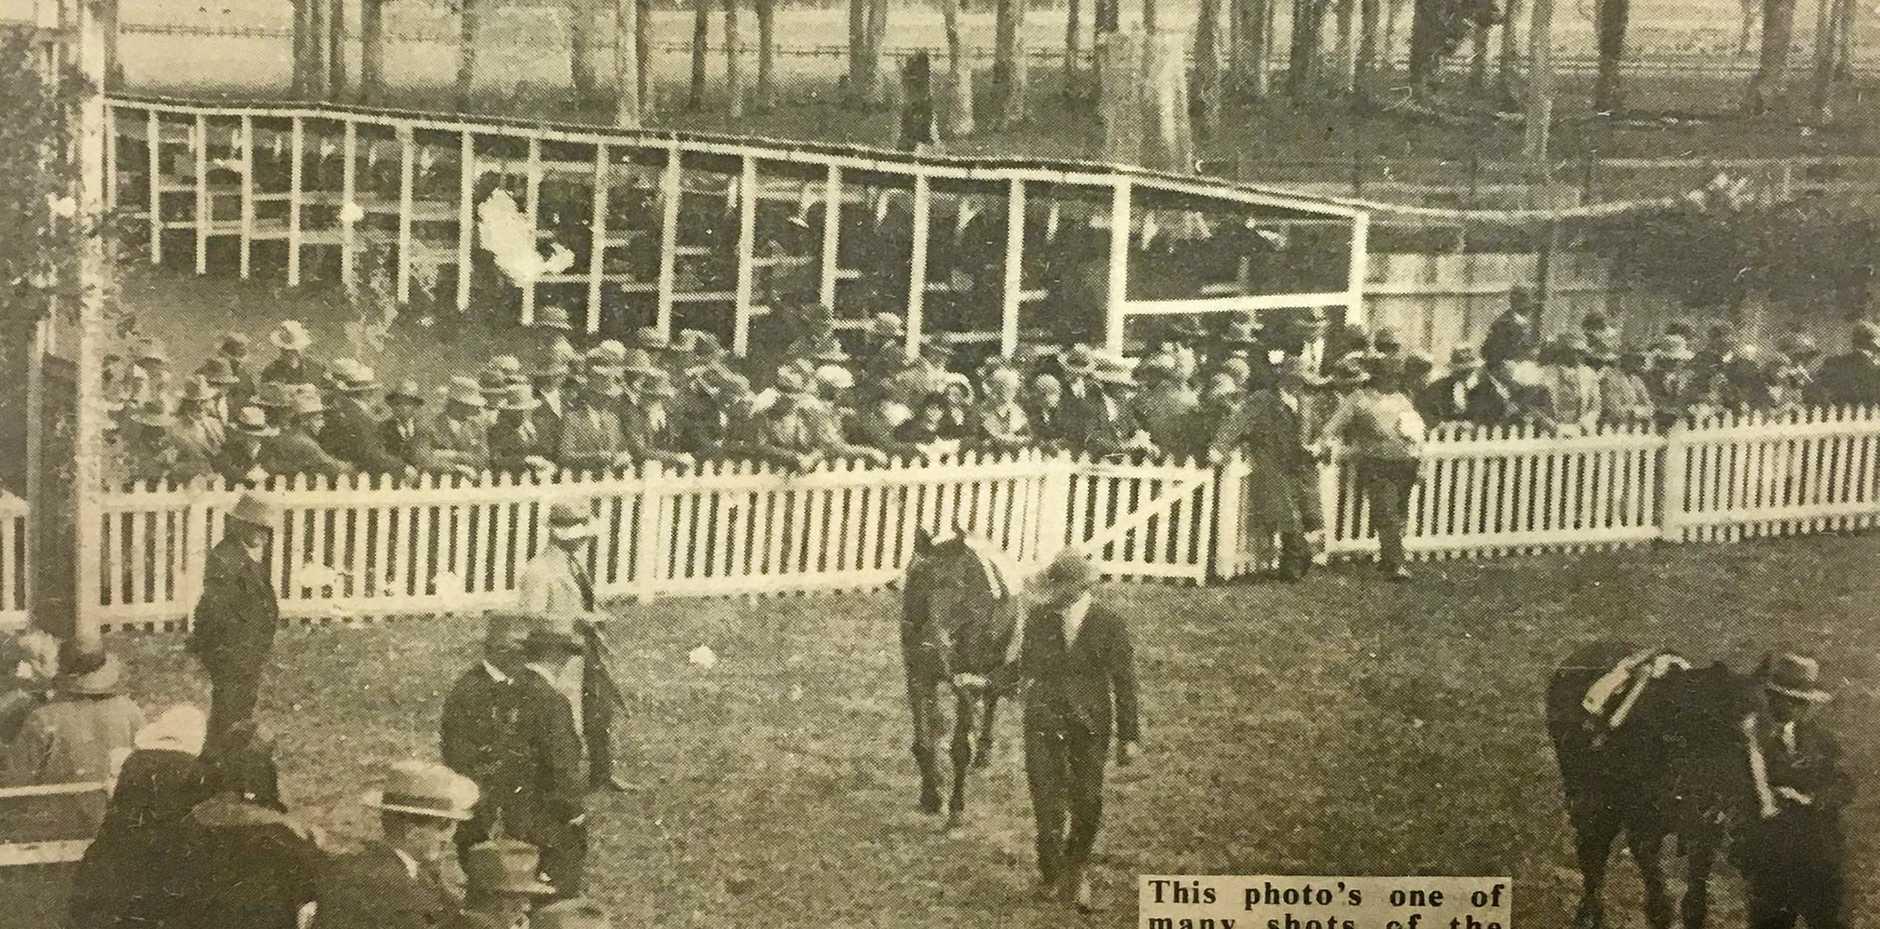 BELOW: The saddling enclosure at an Orara Jockey Club meeting at the former South Course on July 22, 1931. Photo from Atkins family.